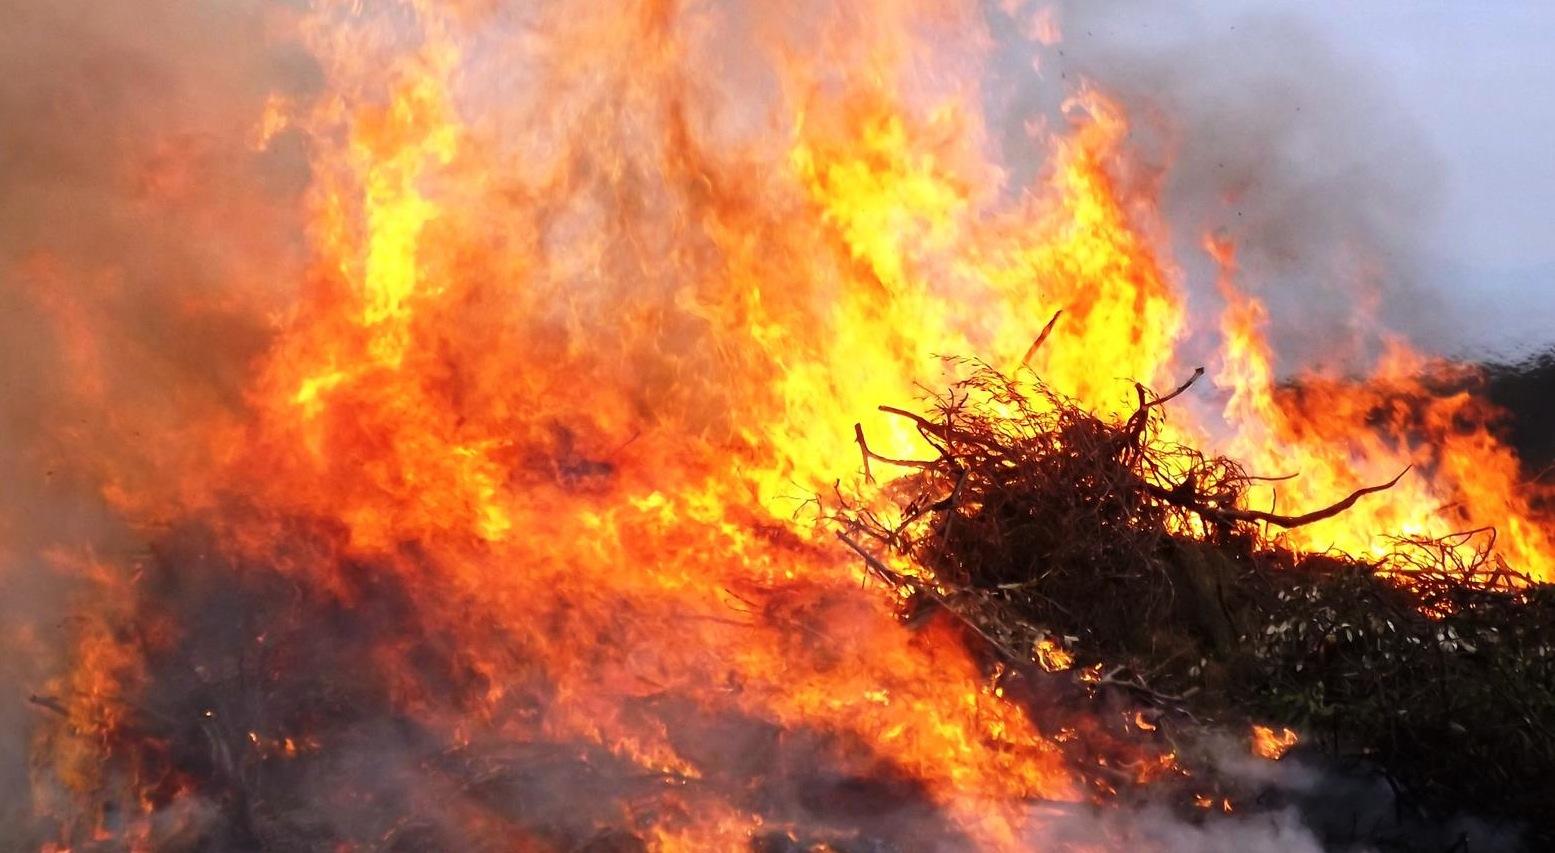 Feu de Calenzana : Un pompier blessé et de gros moyens engagés